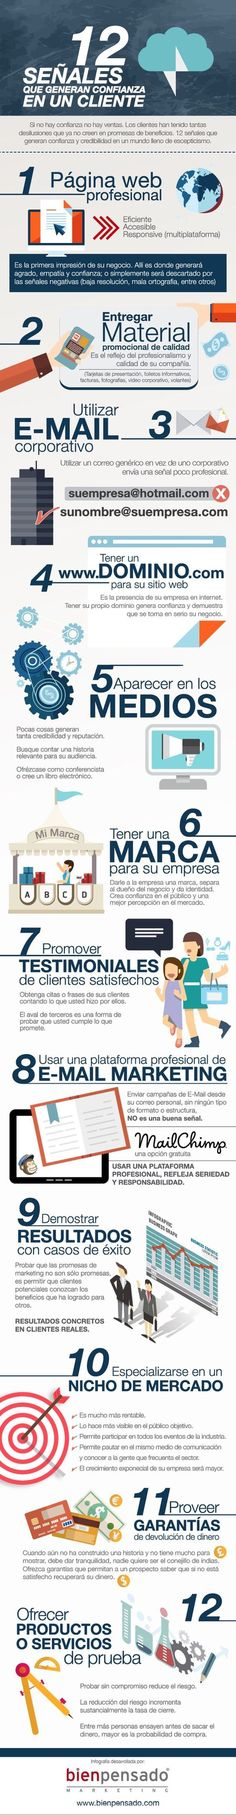 5 Types of Marketing Strategies Proven to Work Online - The Kings Marketing Inbound Marketing, Marketing Online, Marketing And Advertising, Business Marketing, Content Marketing, Internet Marketing, Social Media Marketing, Digital Marketing, Design Social